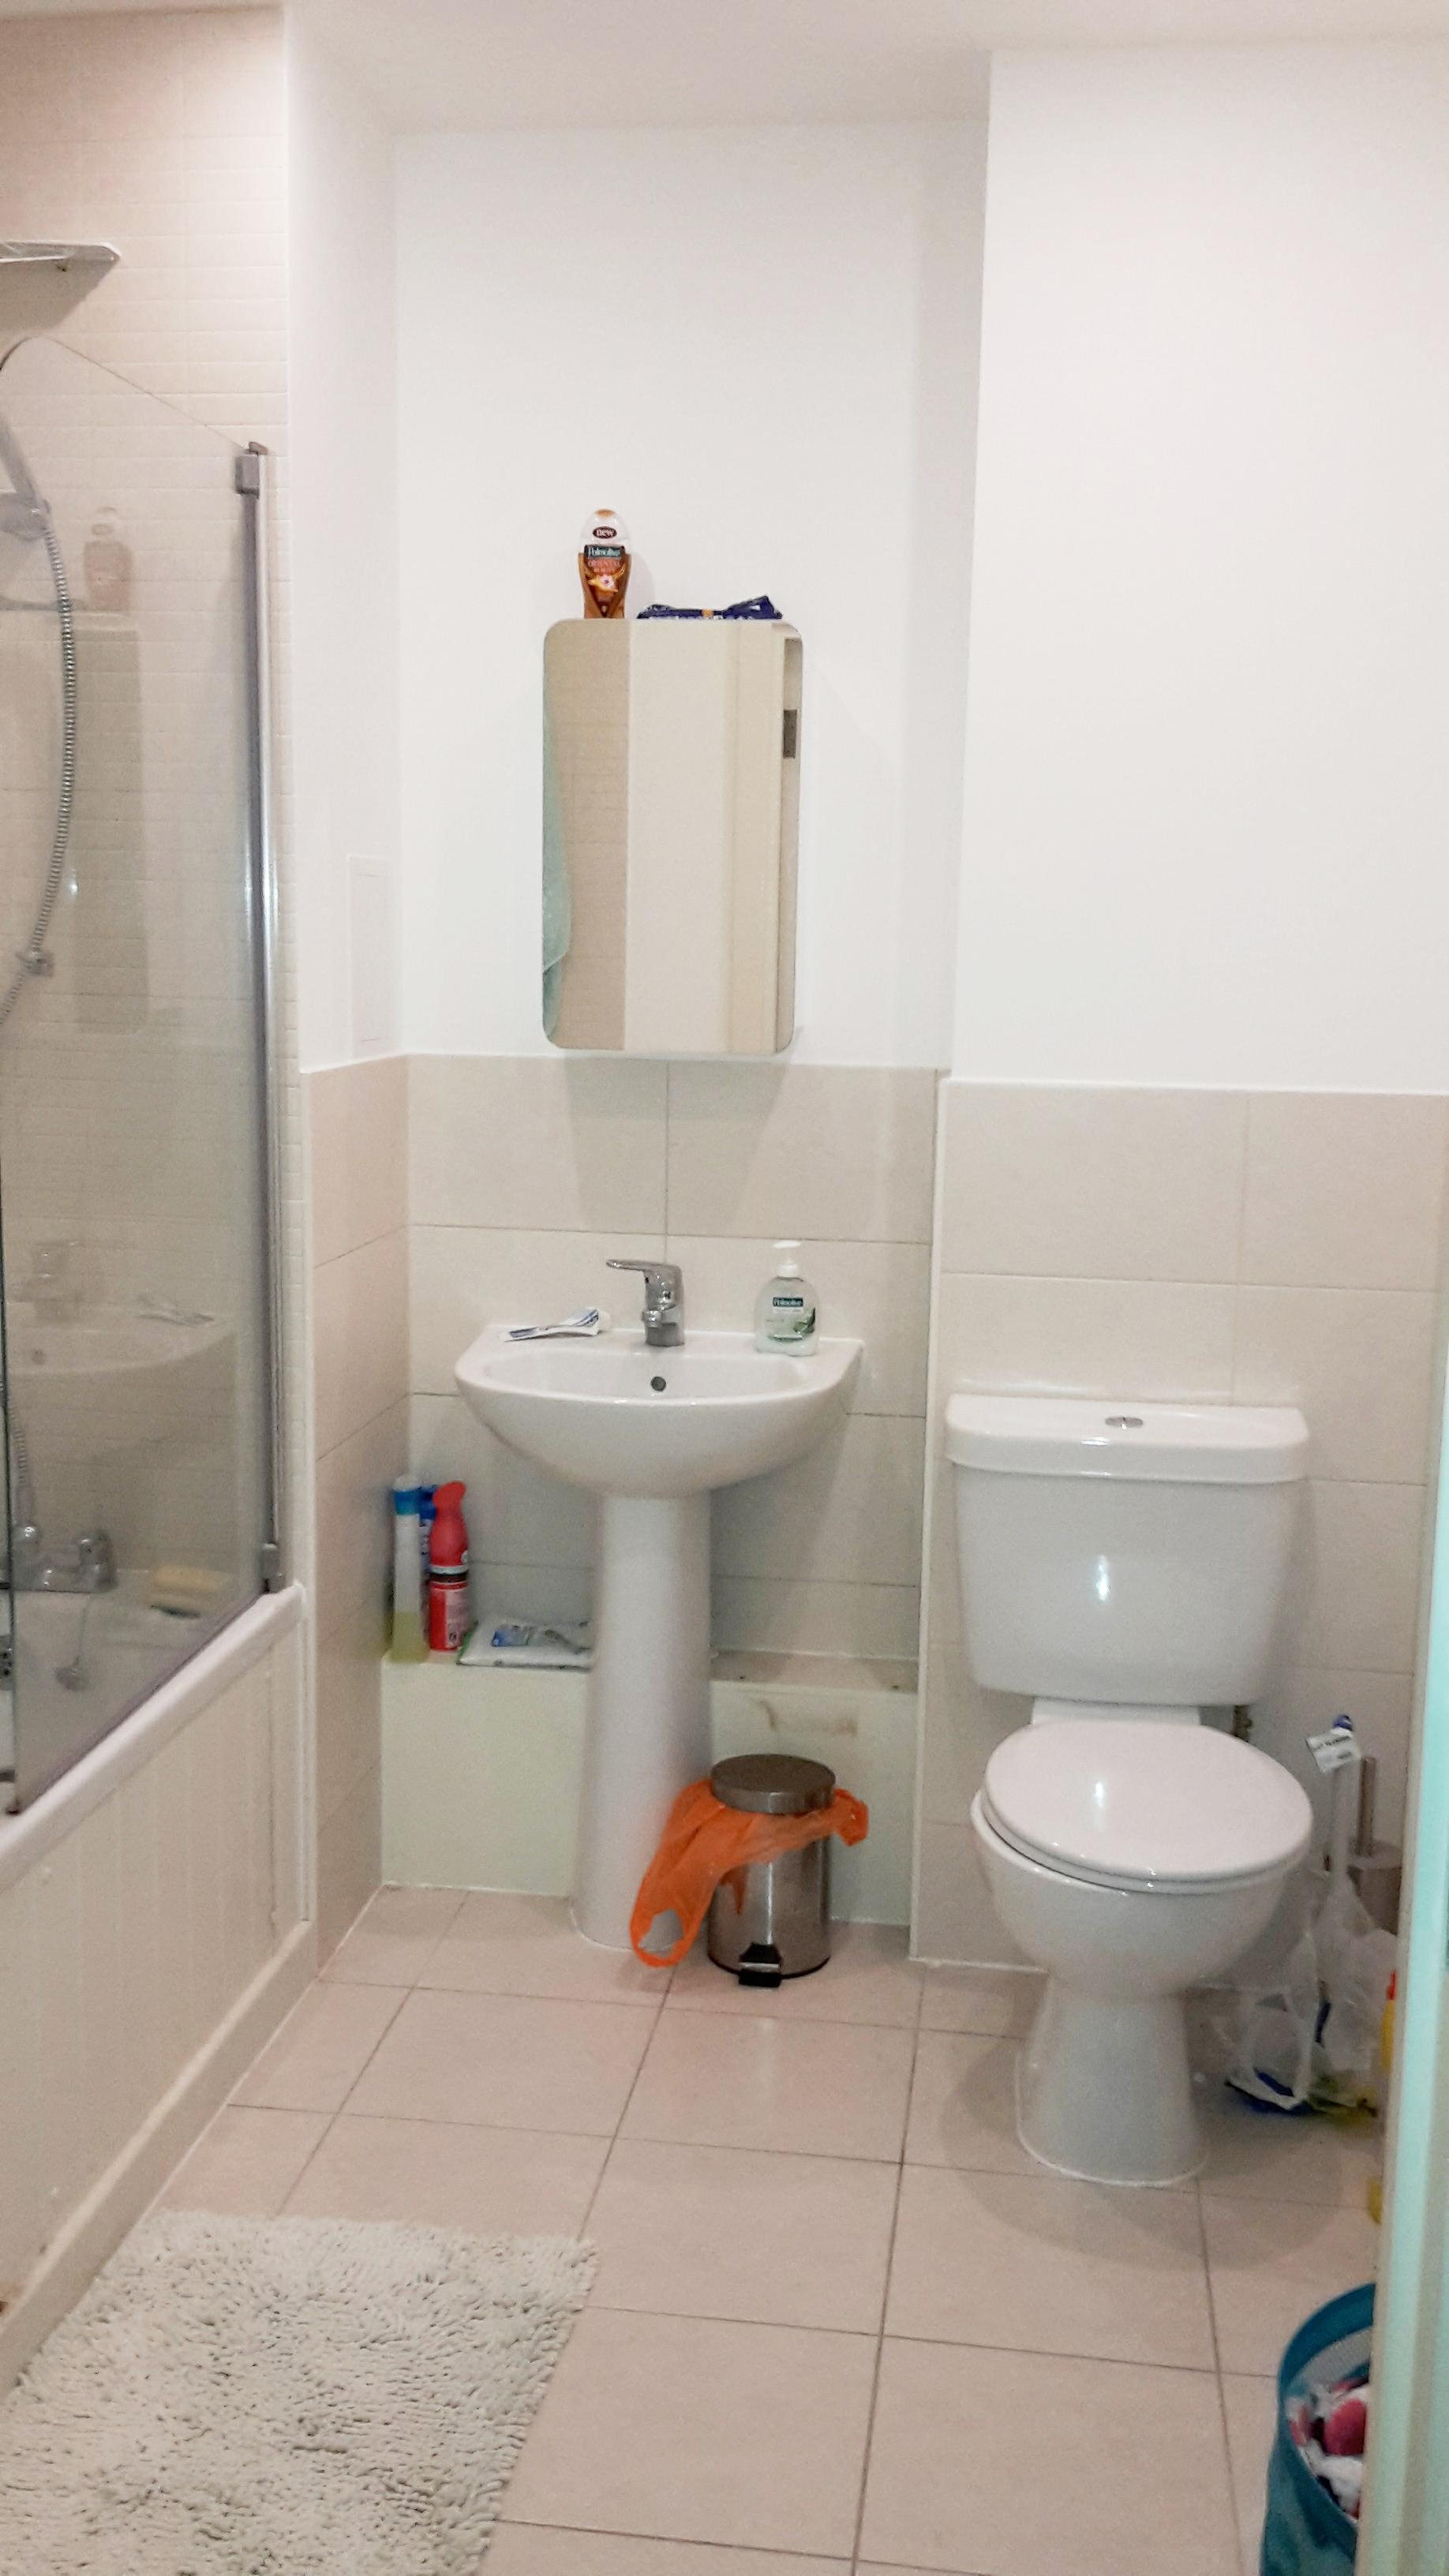 1 Bedroom Flat To Rent Velocity Way Enfield En Canary Wharf En3 7gf